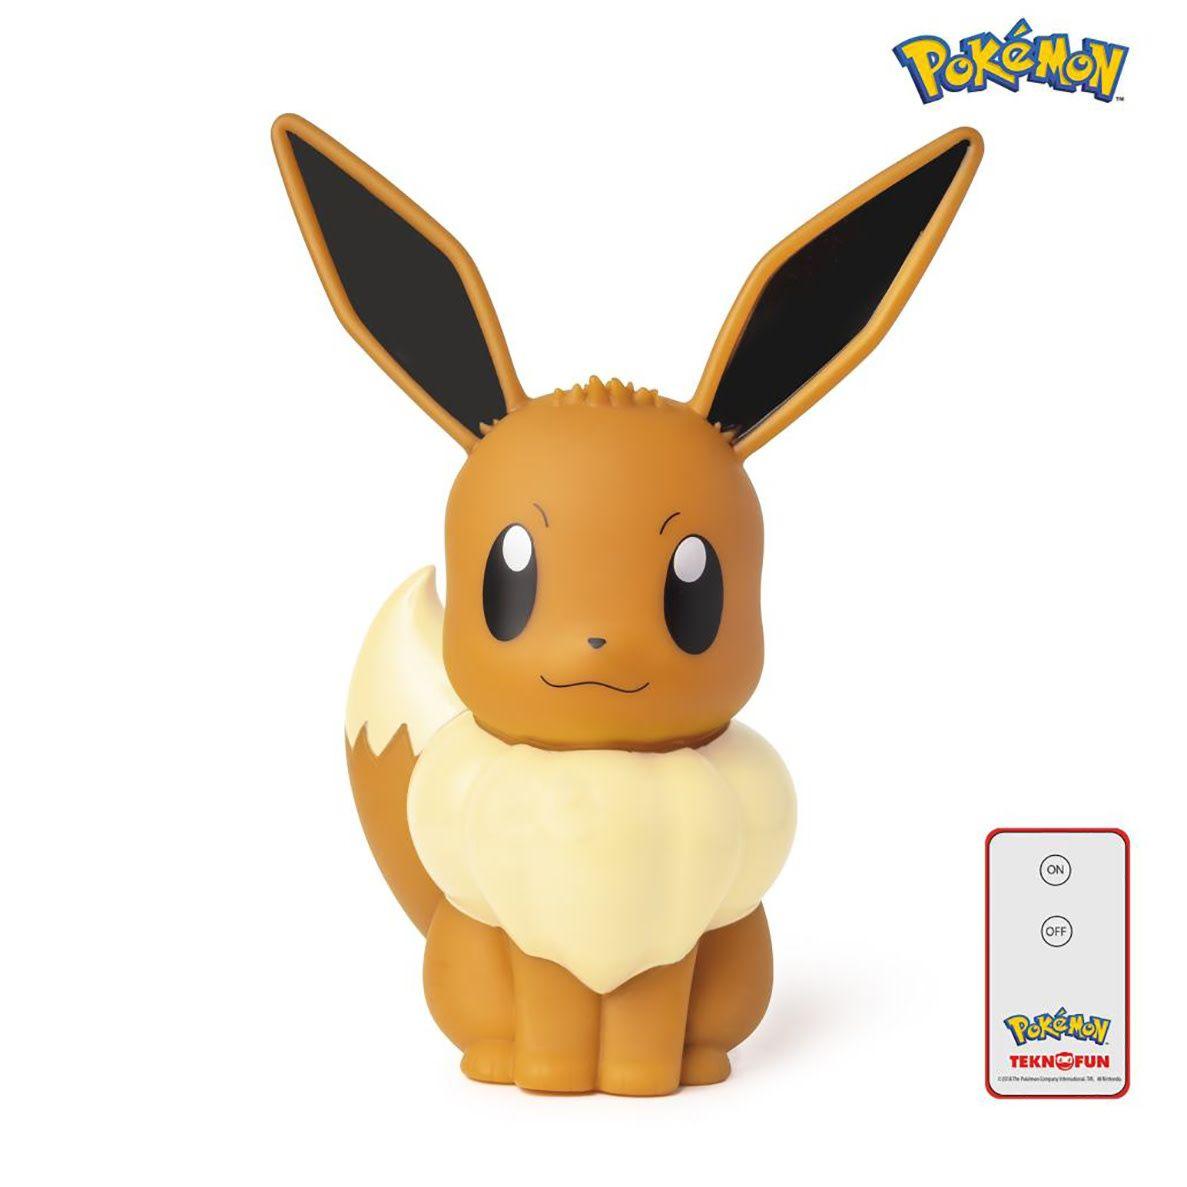 Pokemon Wireless Eevee Led Lamp 30 Cm In 2020 Soft Lighting Pokemon Pokemon Eevee